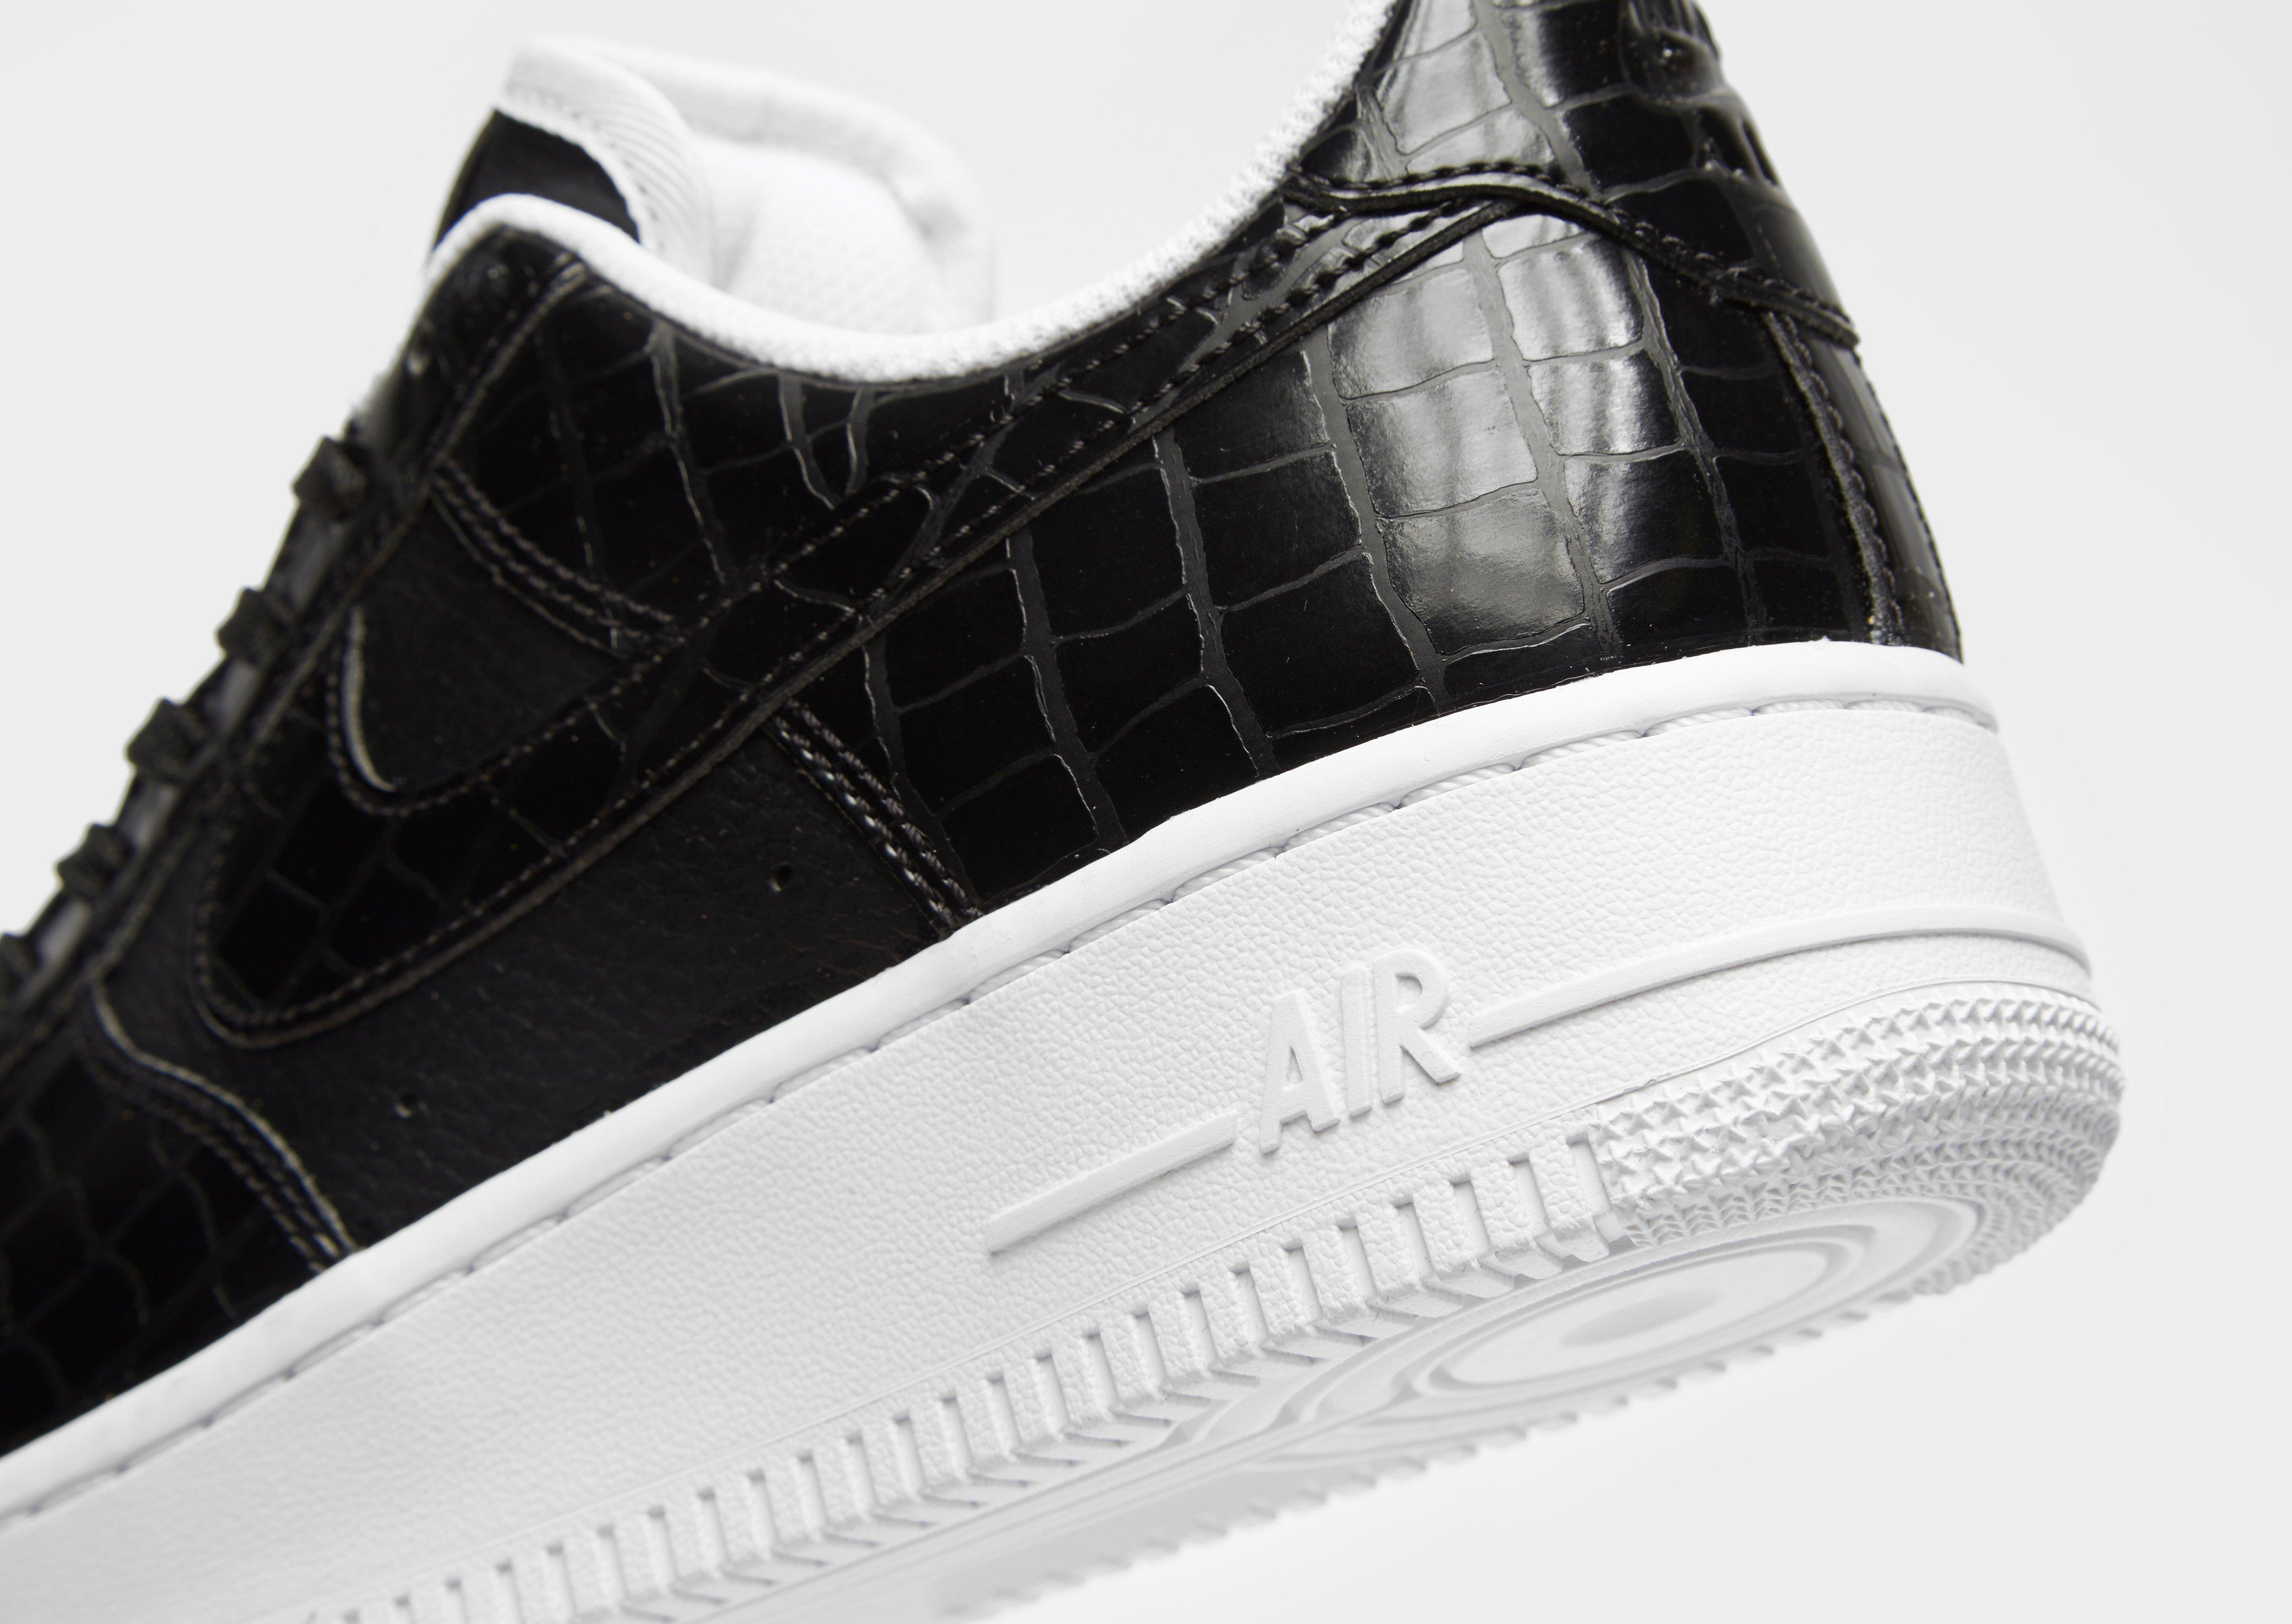 Shop Nike Classic Cortez Herren Schuhe Grossentabelle